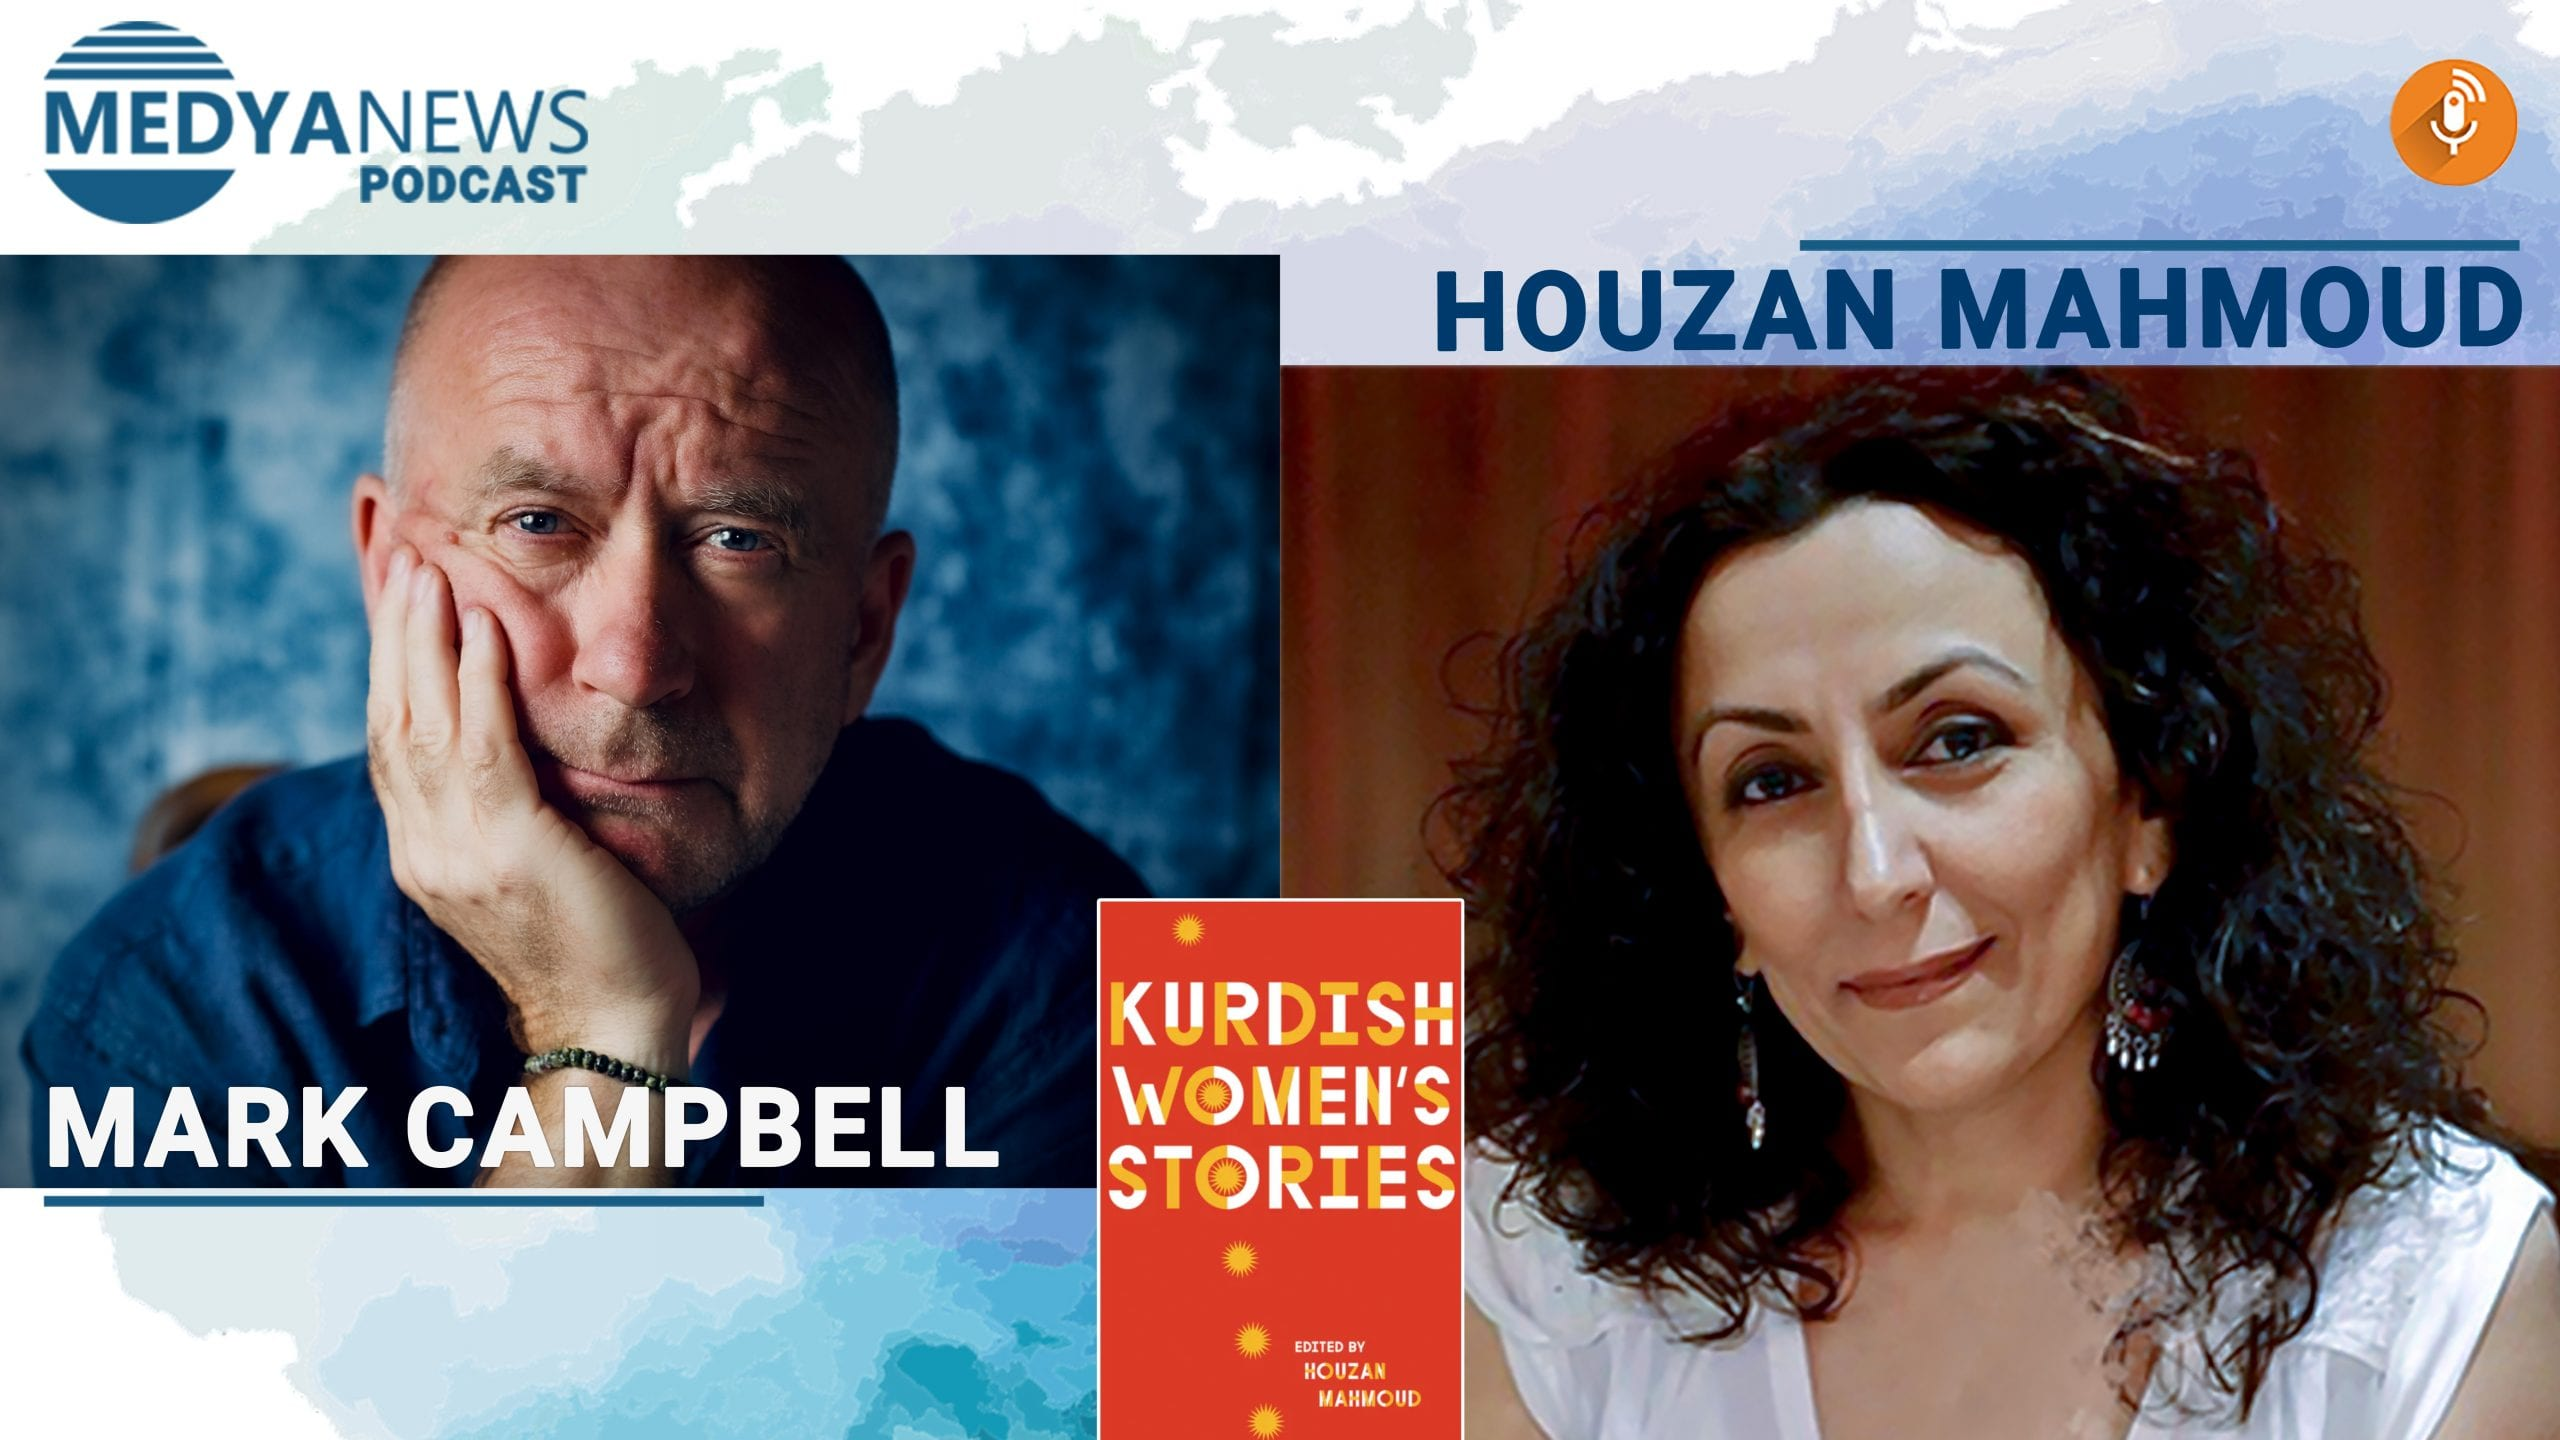 Mark Campbell talks to Houzan Mahmud about her new book Kurdish Women's Stories